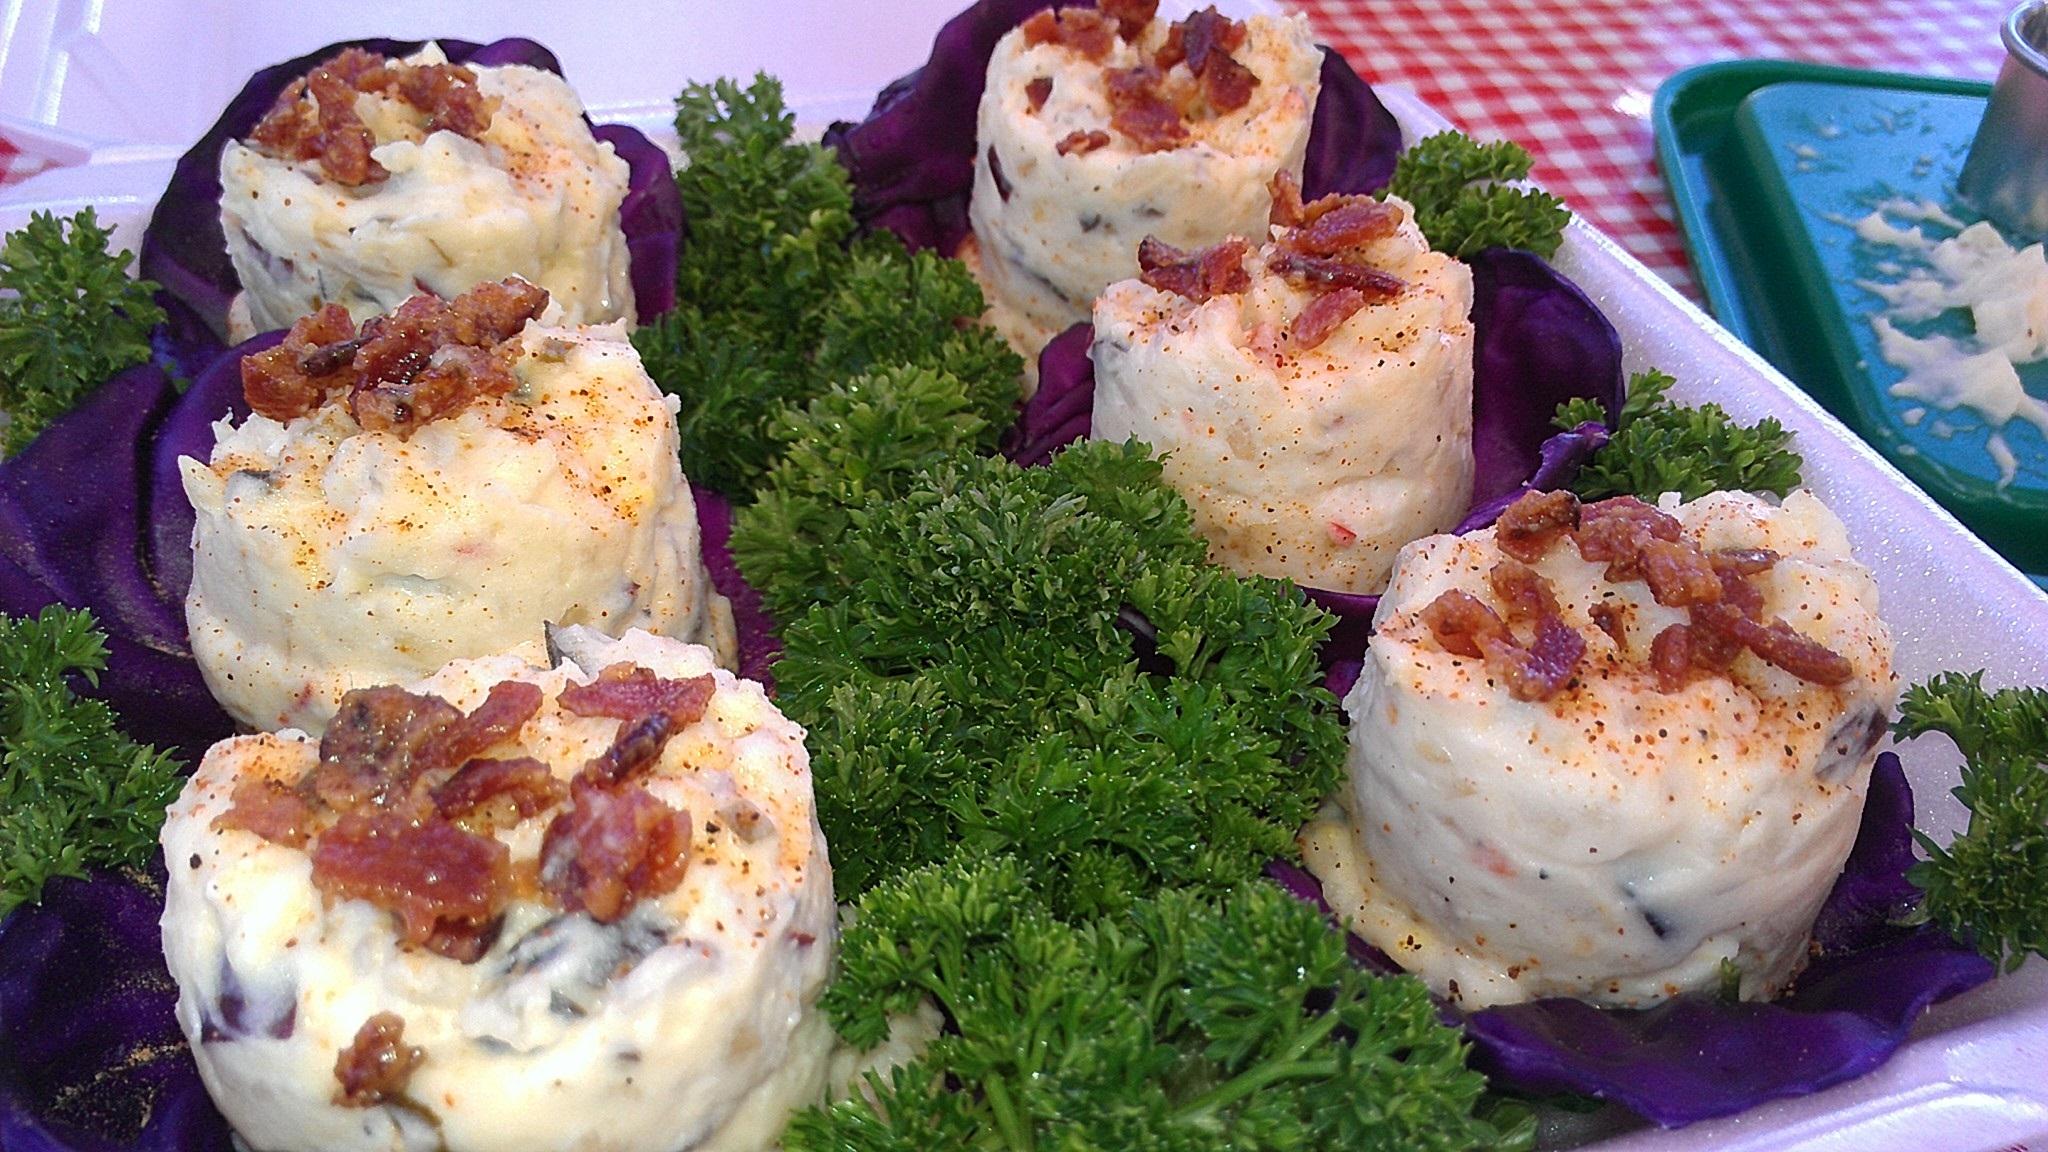 Award winning Country Potato Salad | Slap Yo' Daddy BBQ